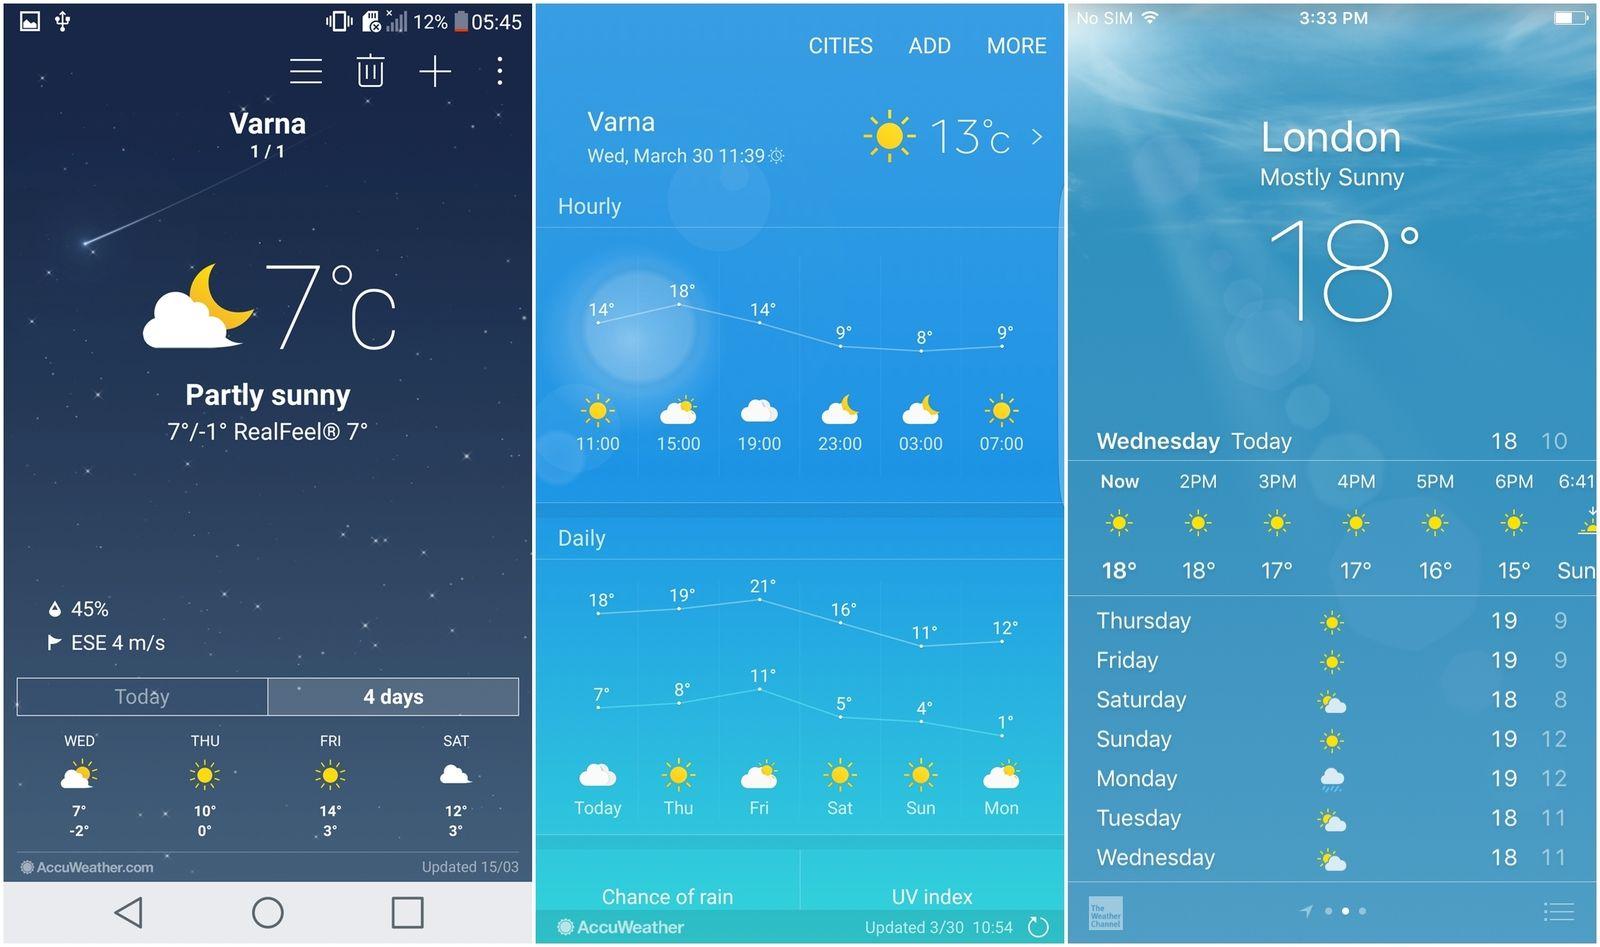 LG G5 (LG UX) vs Samsung Galaxy S7 (TouchWiz) vs Apple